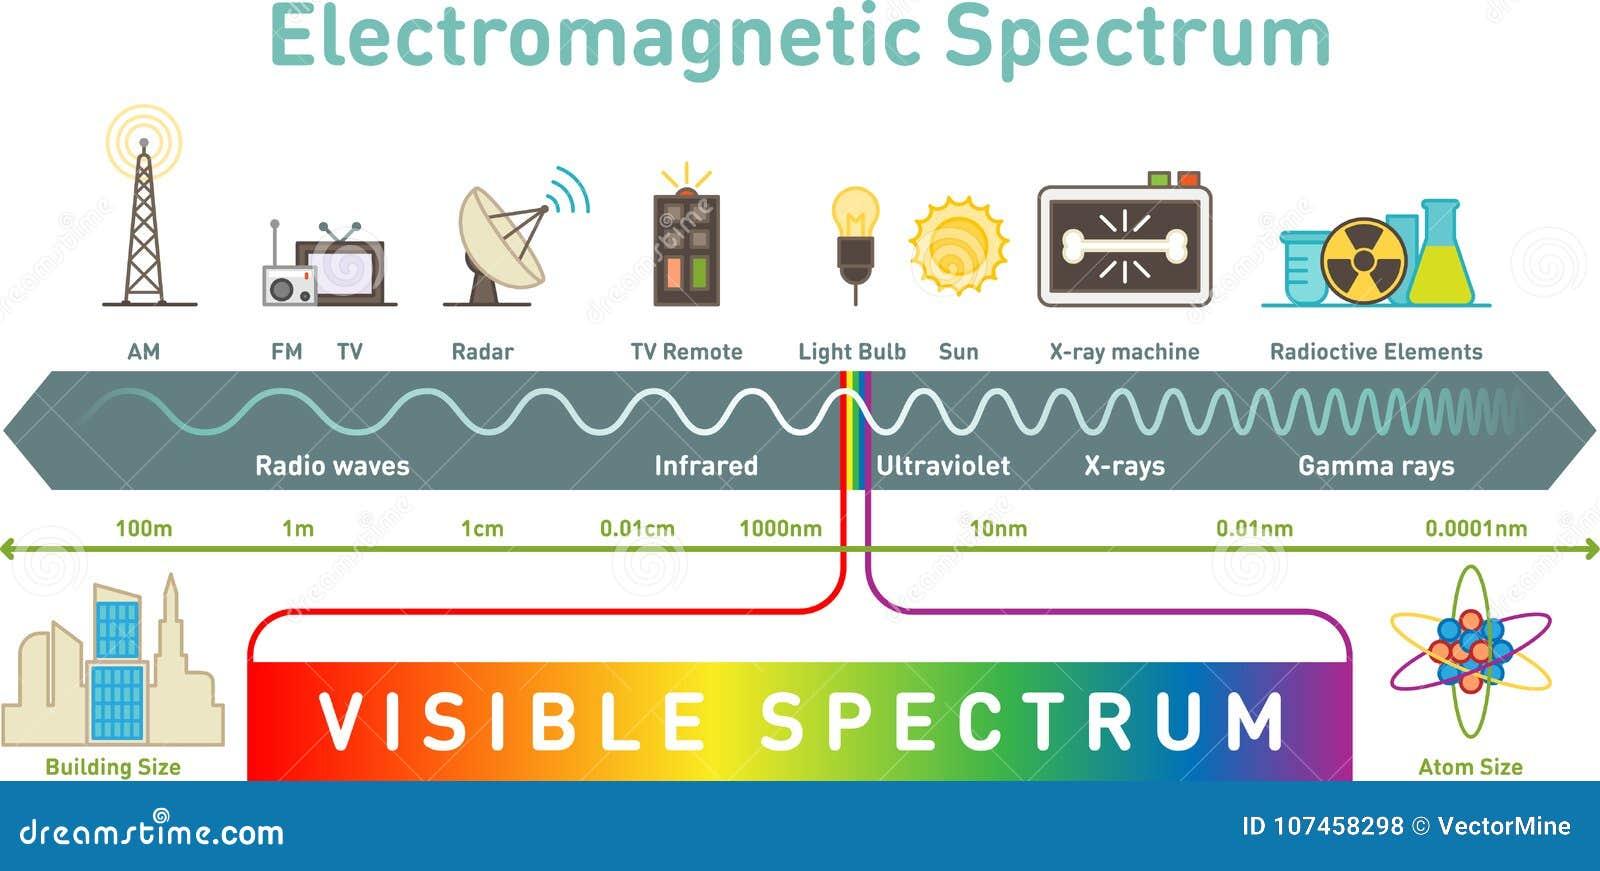 Electromagnetic spectrum diagram poster circuit connection diagram electromagnetic spectrum infographic diagram vector illustration rh dreamstime com fcc spectrum diagram fcc spectrum diagram ccuart Images